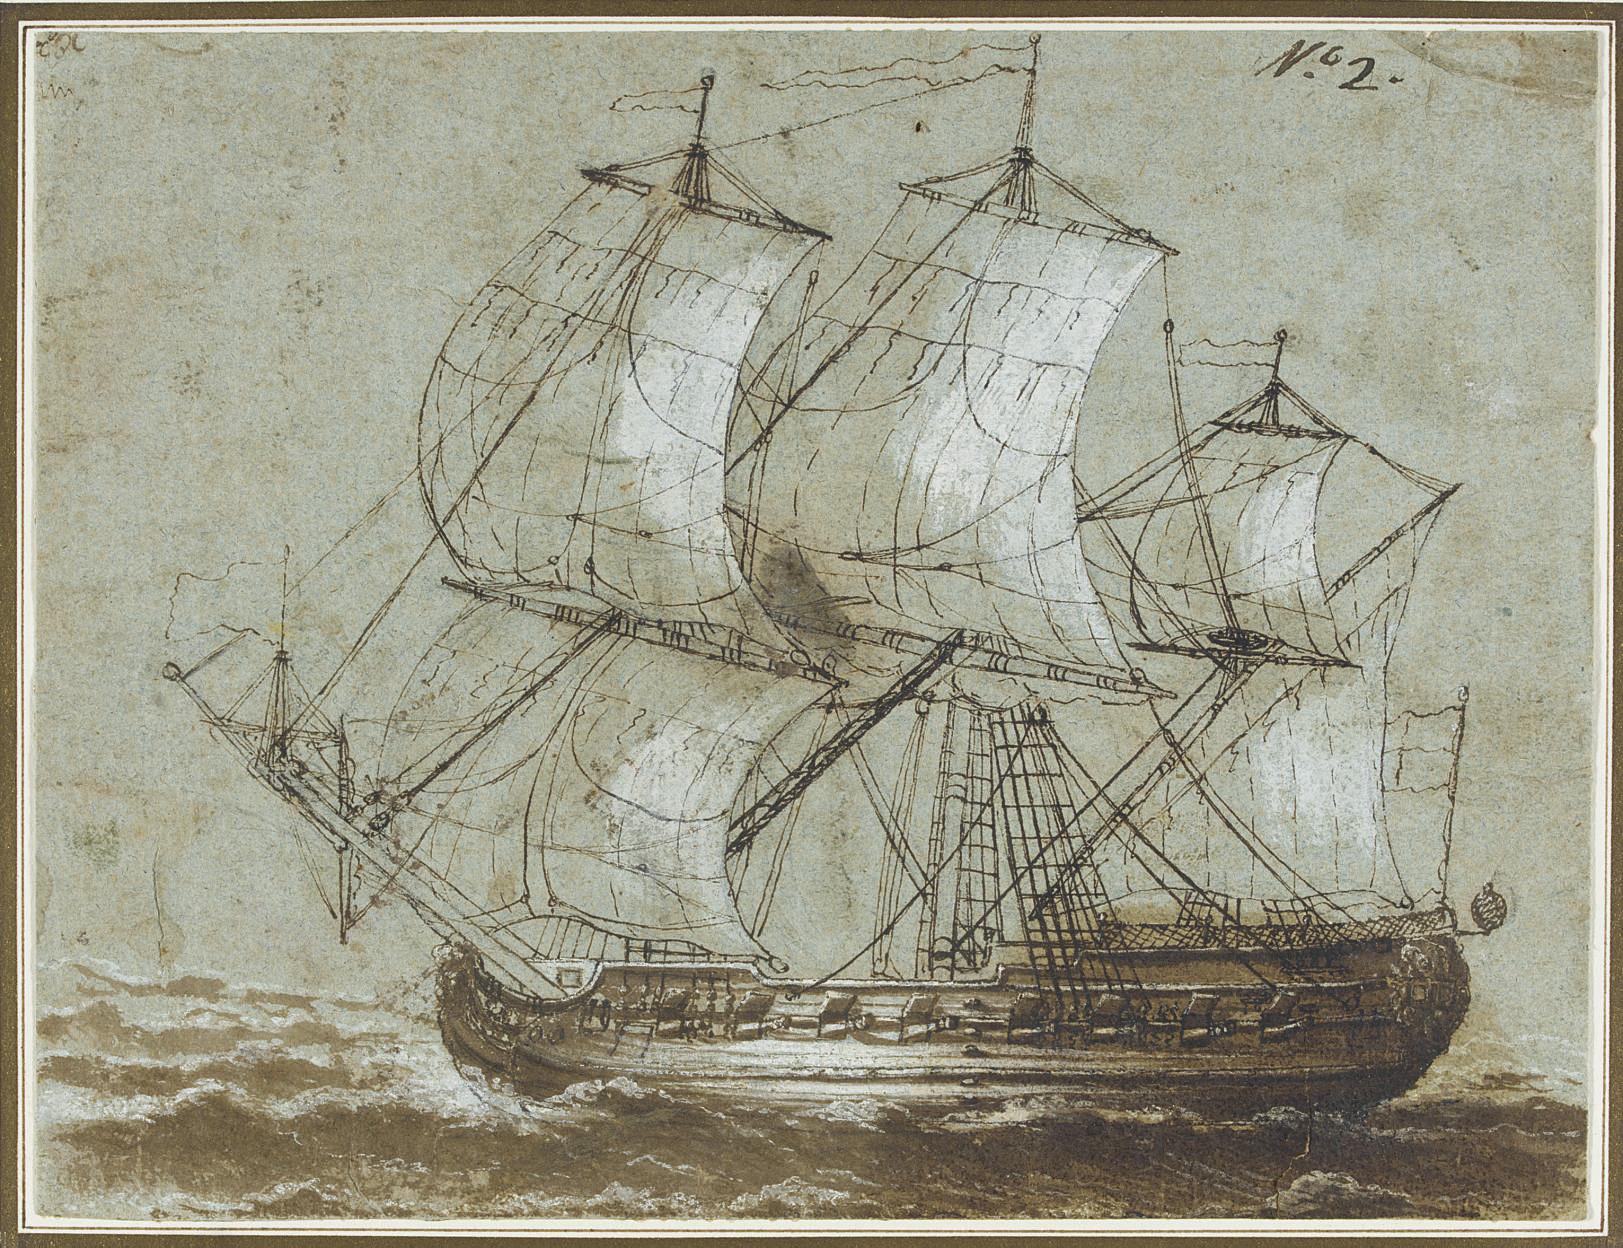 Attributed to Pieter Mulier, c